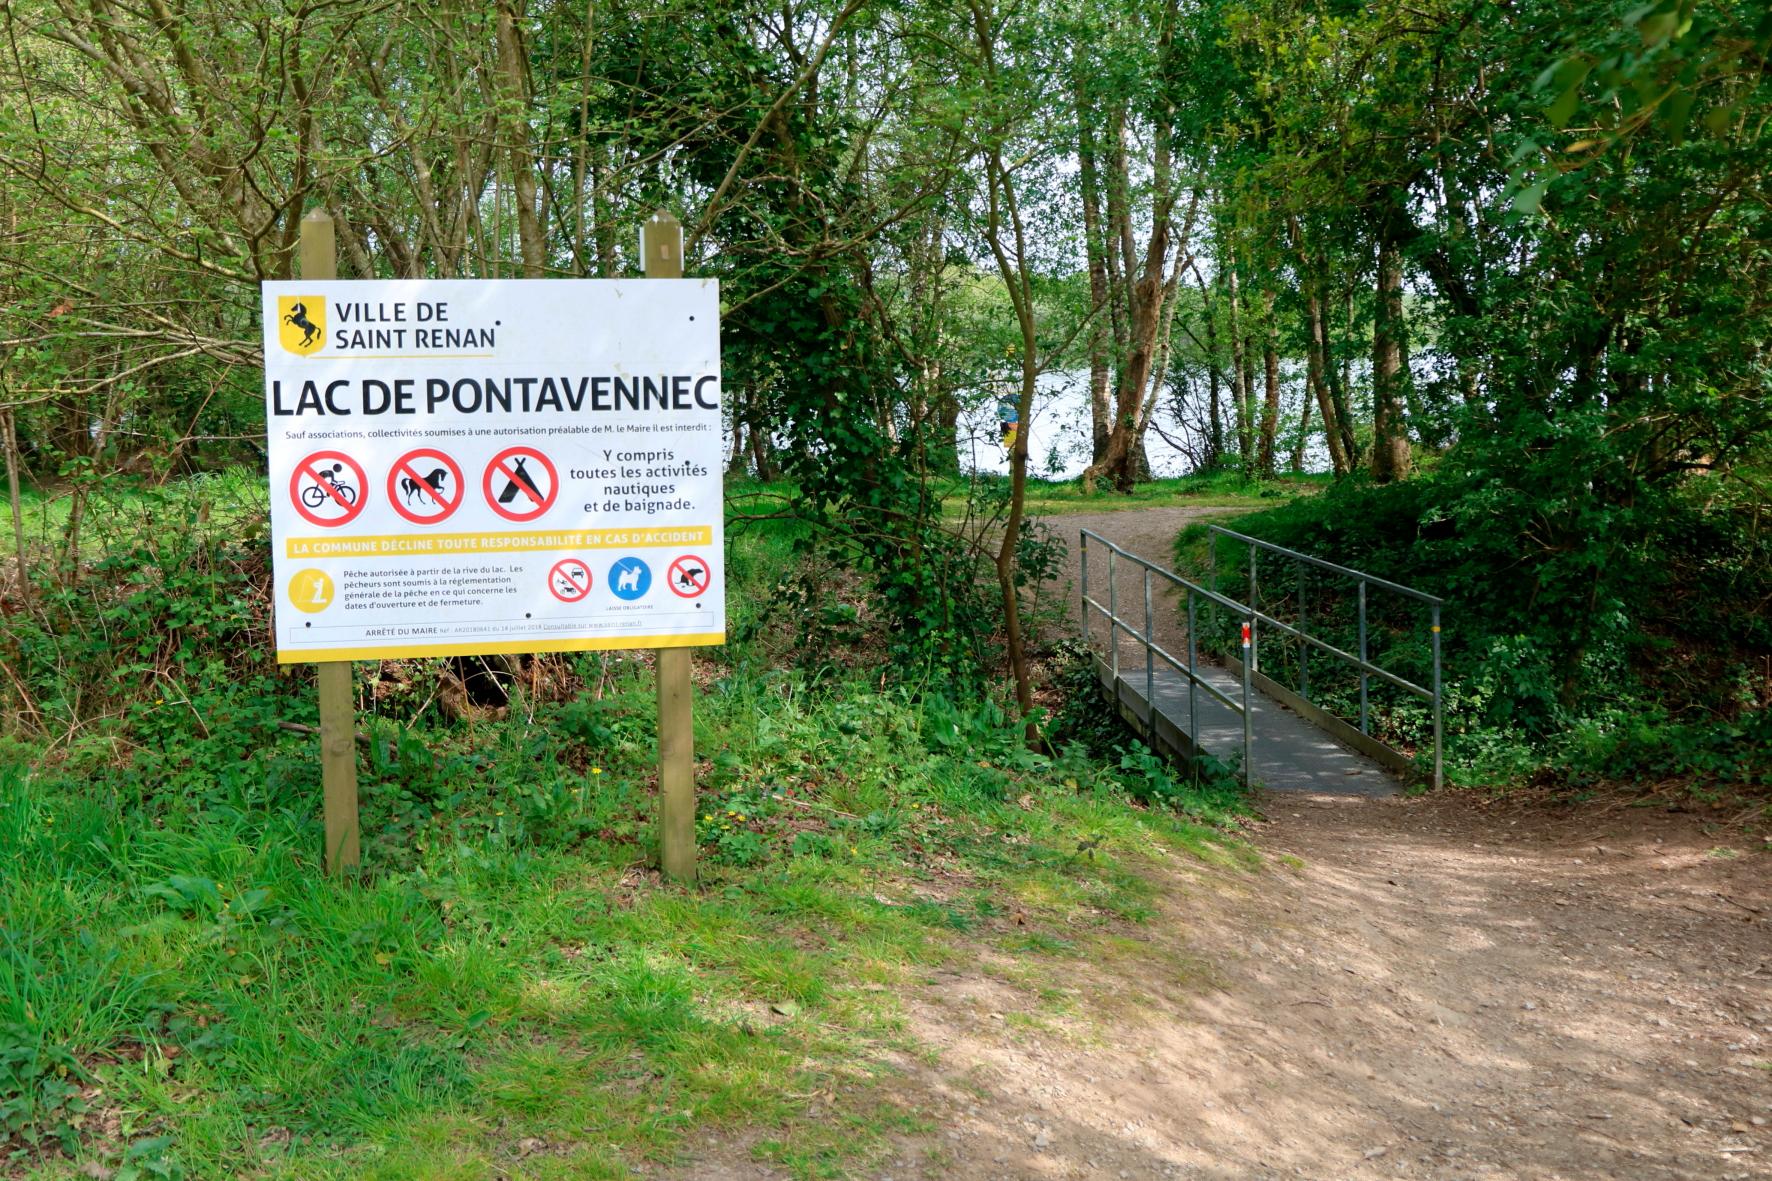 Pontavennec-24-04-101